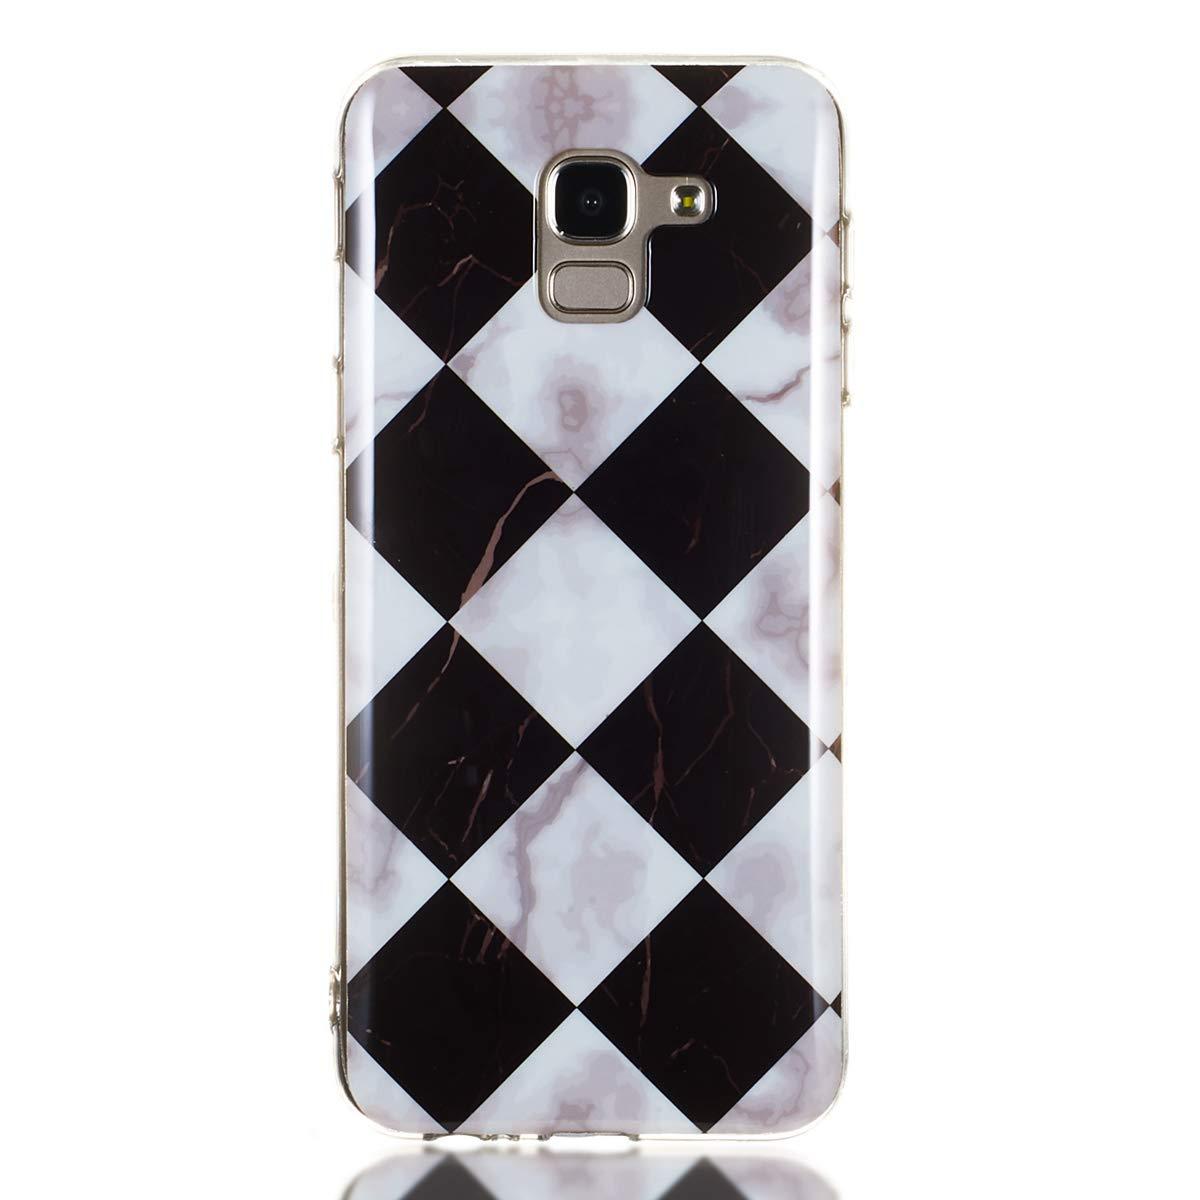 Triangle Noir Misstars Coque en Silicone pour Samsung Galaxy J6 Plus 2018 Marbre Ultra Mince TPU Souple Flexible Housse Etui de Protection Anti-Choc Anti-Rayures Bumper